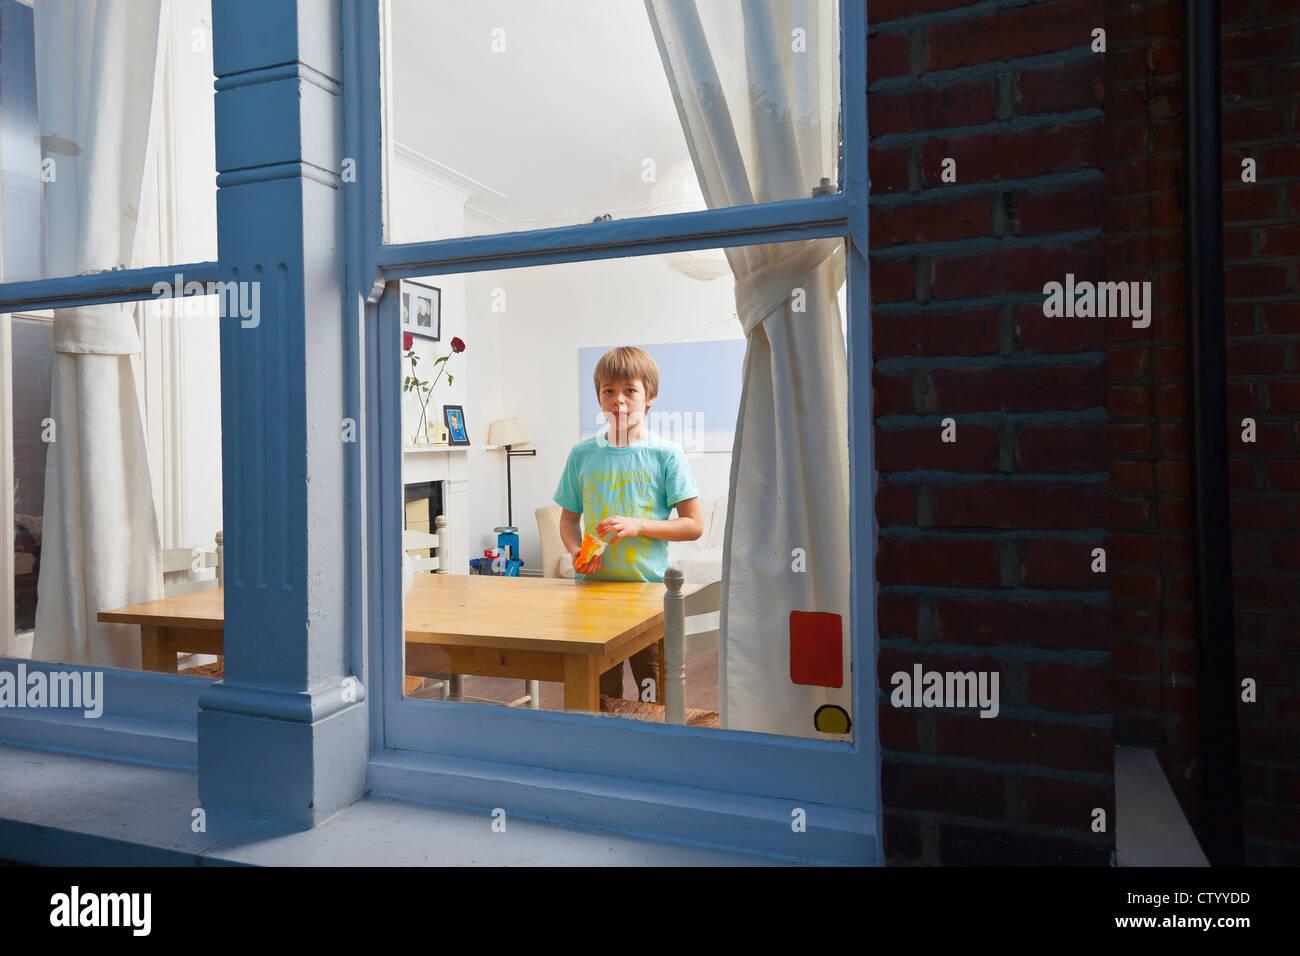 Boy in living room viewed through window - Stock Image